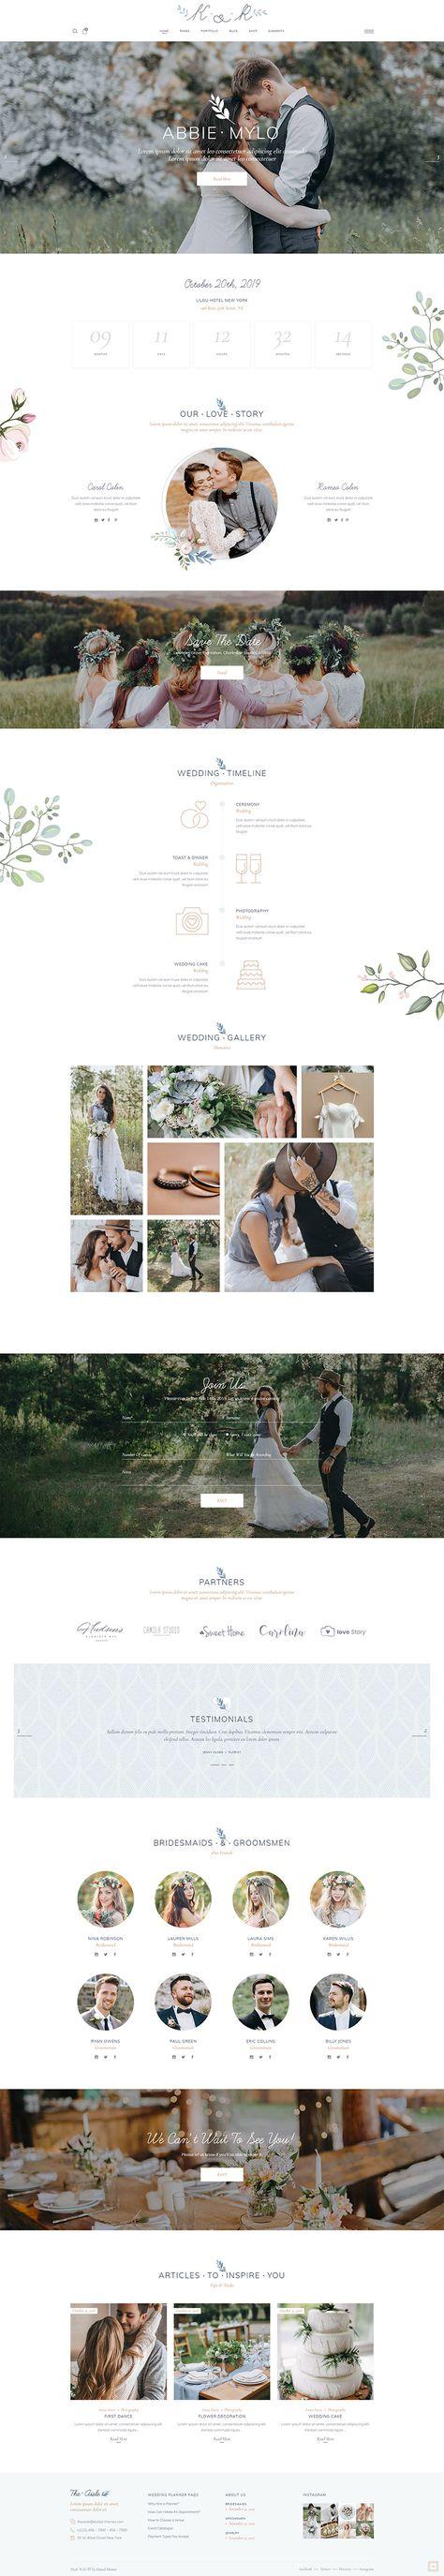 Create an elegant wedding website for your most important day with The Aisle WordPress theme!   #wordpress #webdesign #websitedesign #designinspiration #wedding #celebration #weddingplanner #weddingwebsite #weddinginspiration #weddingbusiness #weddingday #weddingphoto #feminine #elegant